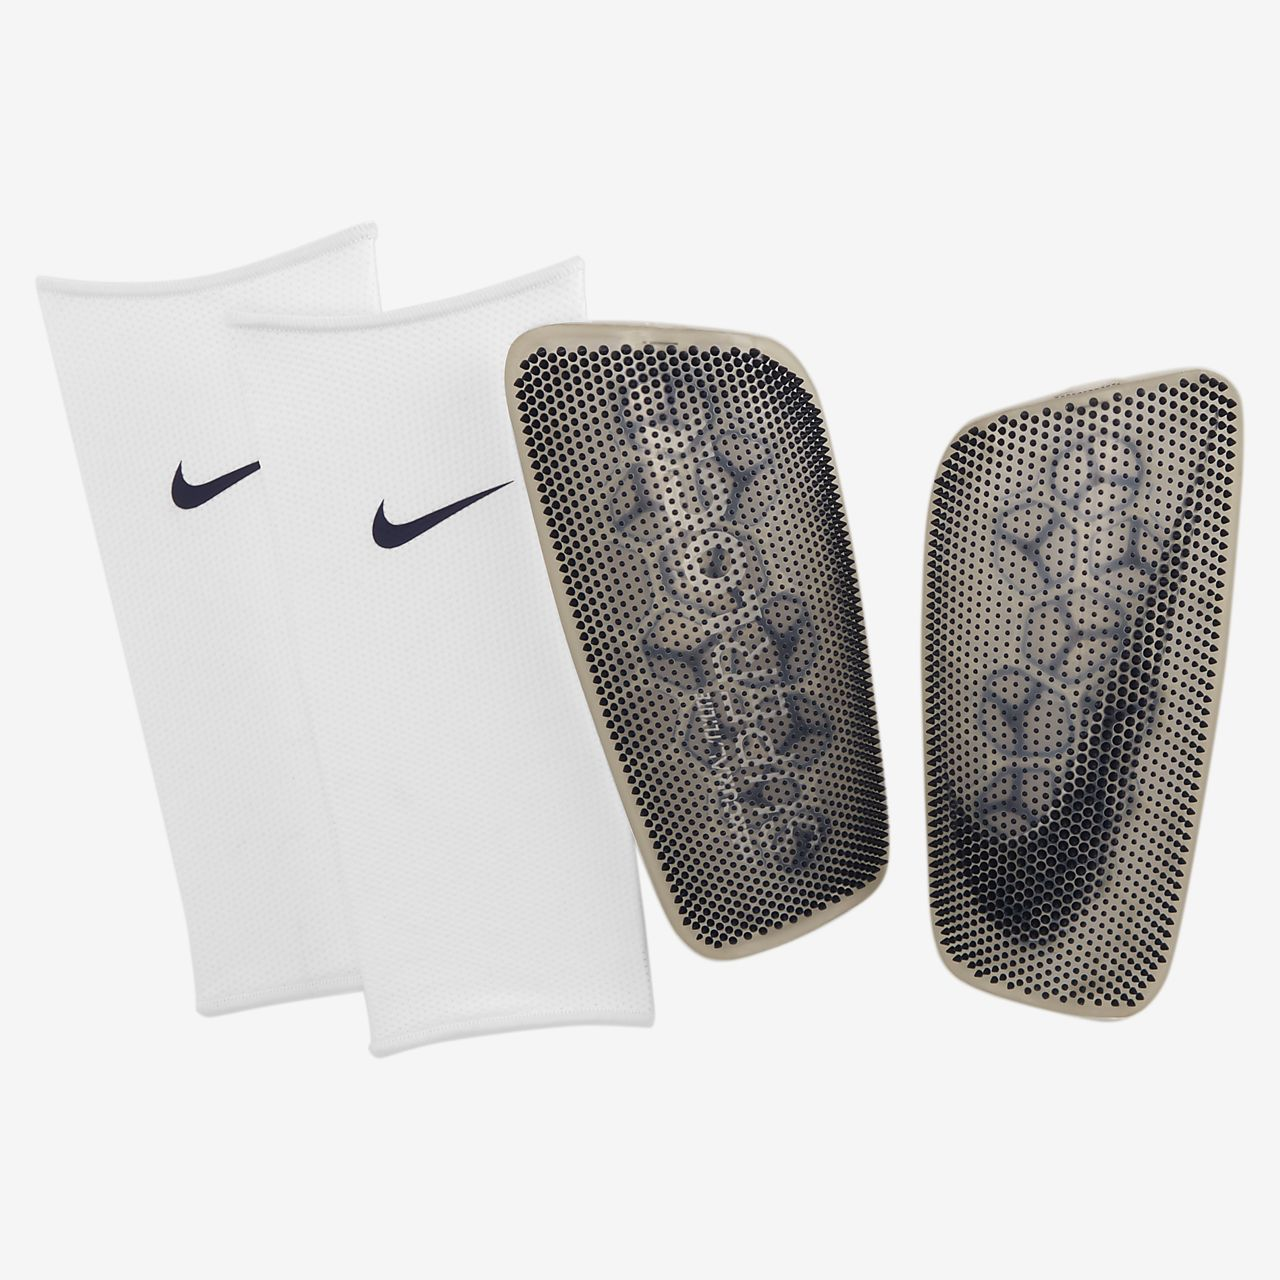 Nike Mercurial FlyLite Superlock-fodboldbenskinner